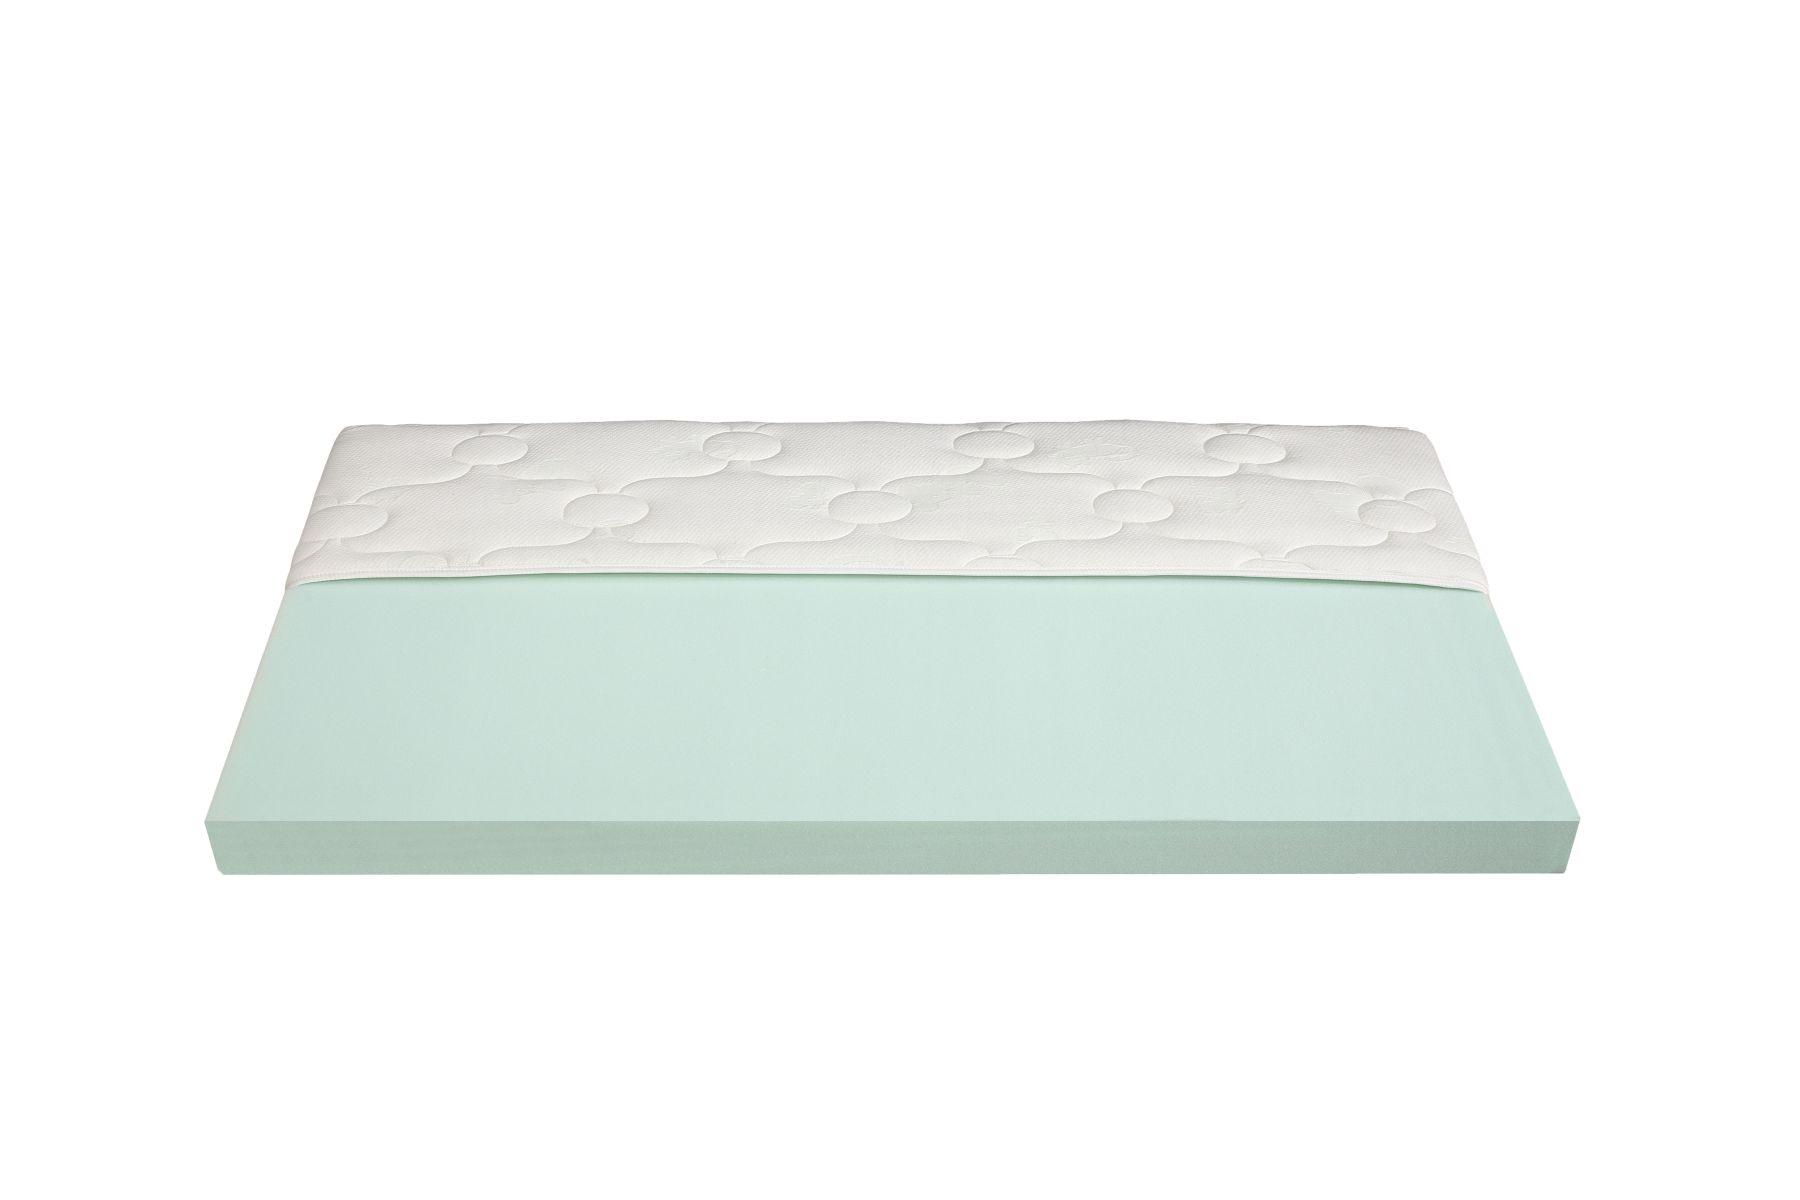 matratze f r kinder matratzen u topper tinas bettenladen. Black Bedroom Furniture Sets. Home Design Ideas